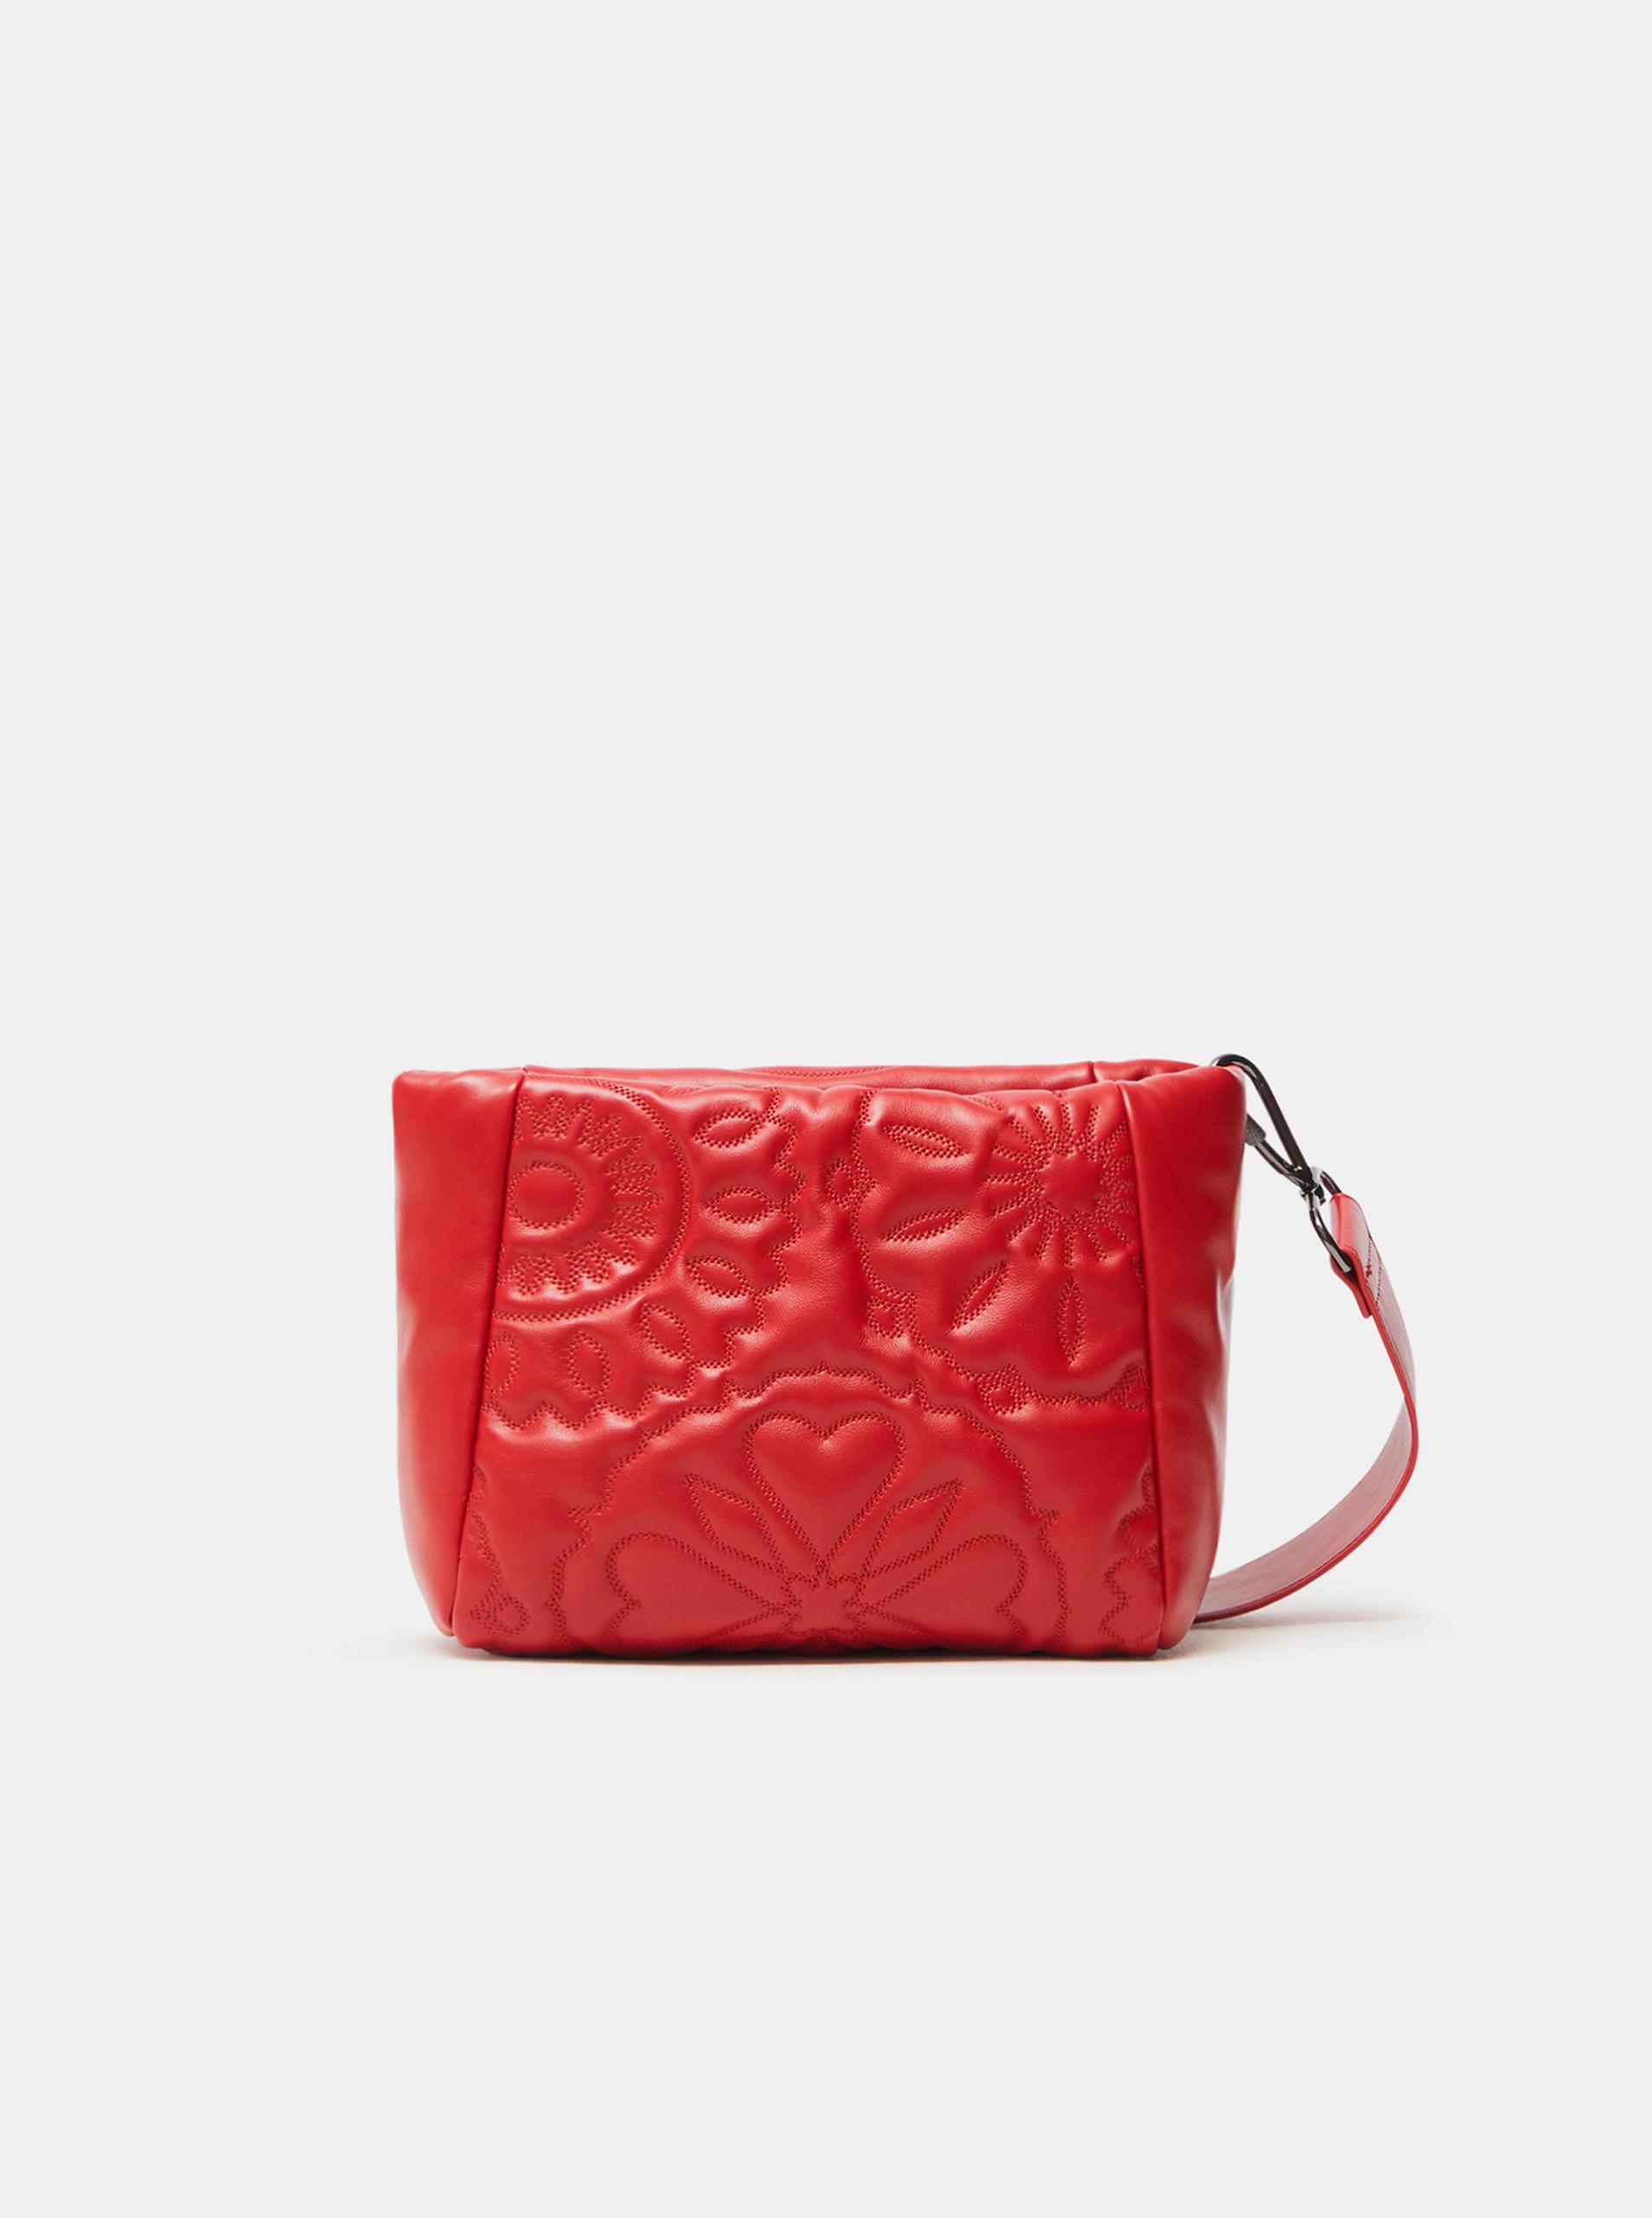 Desigual Women's bag red  Big